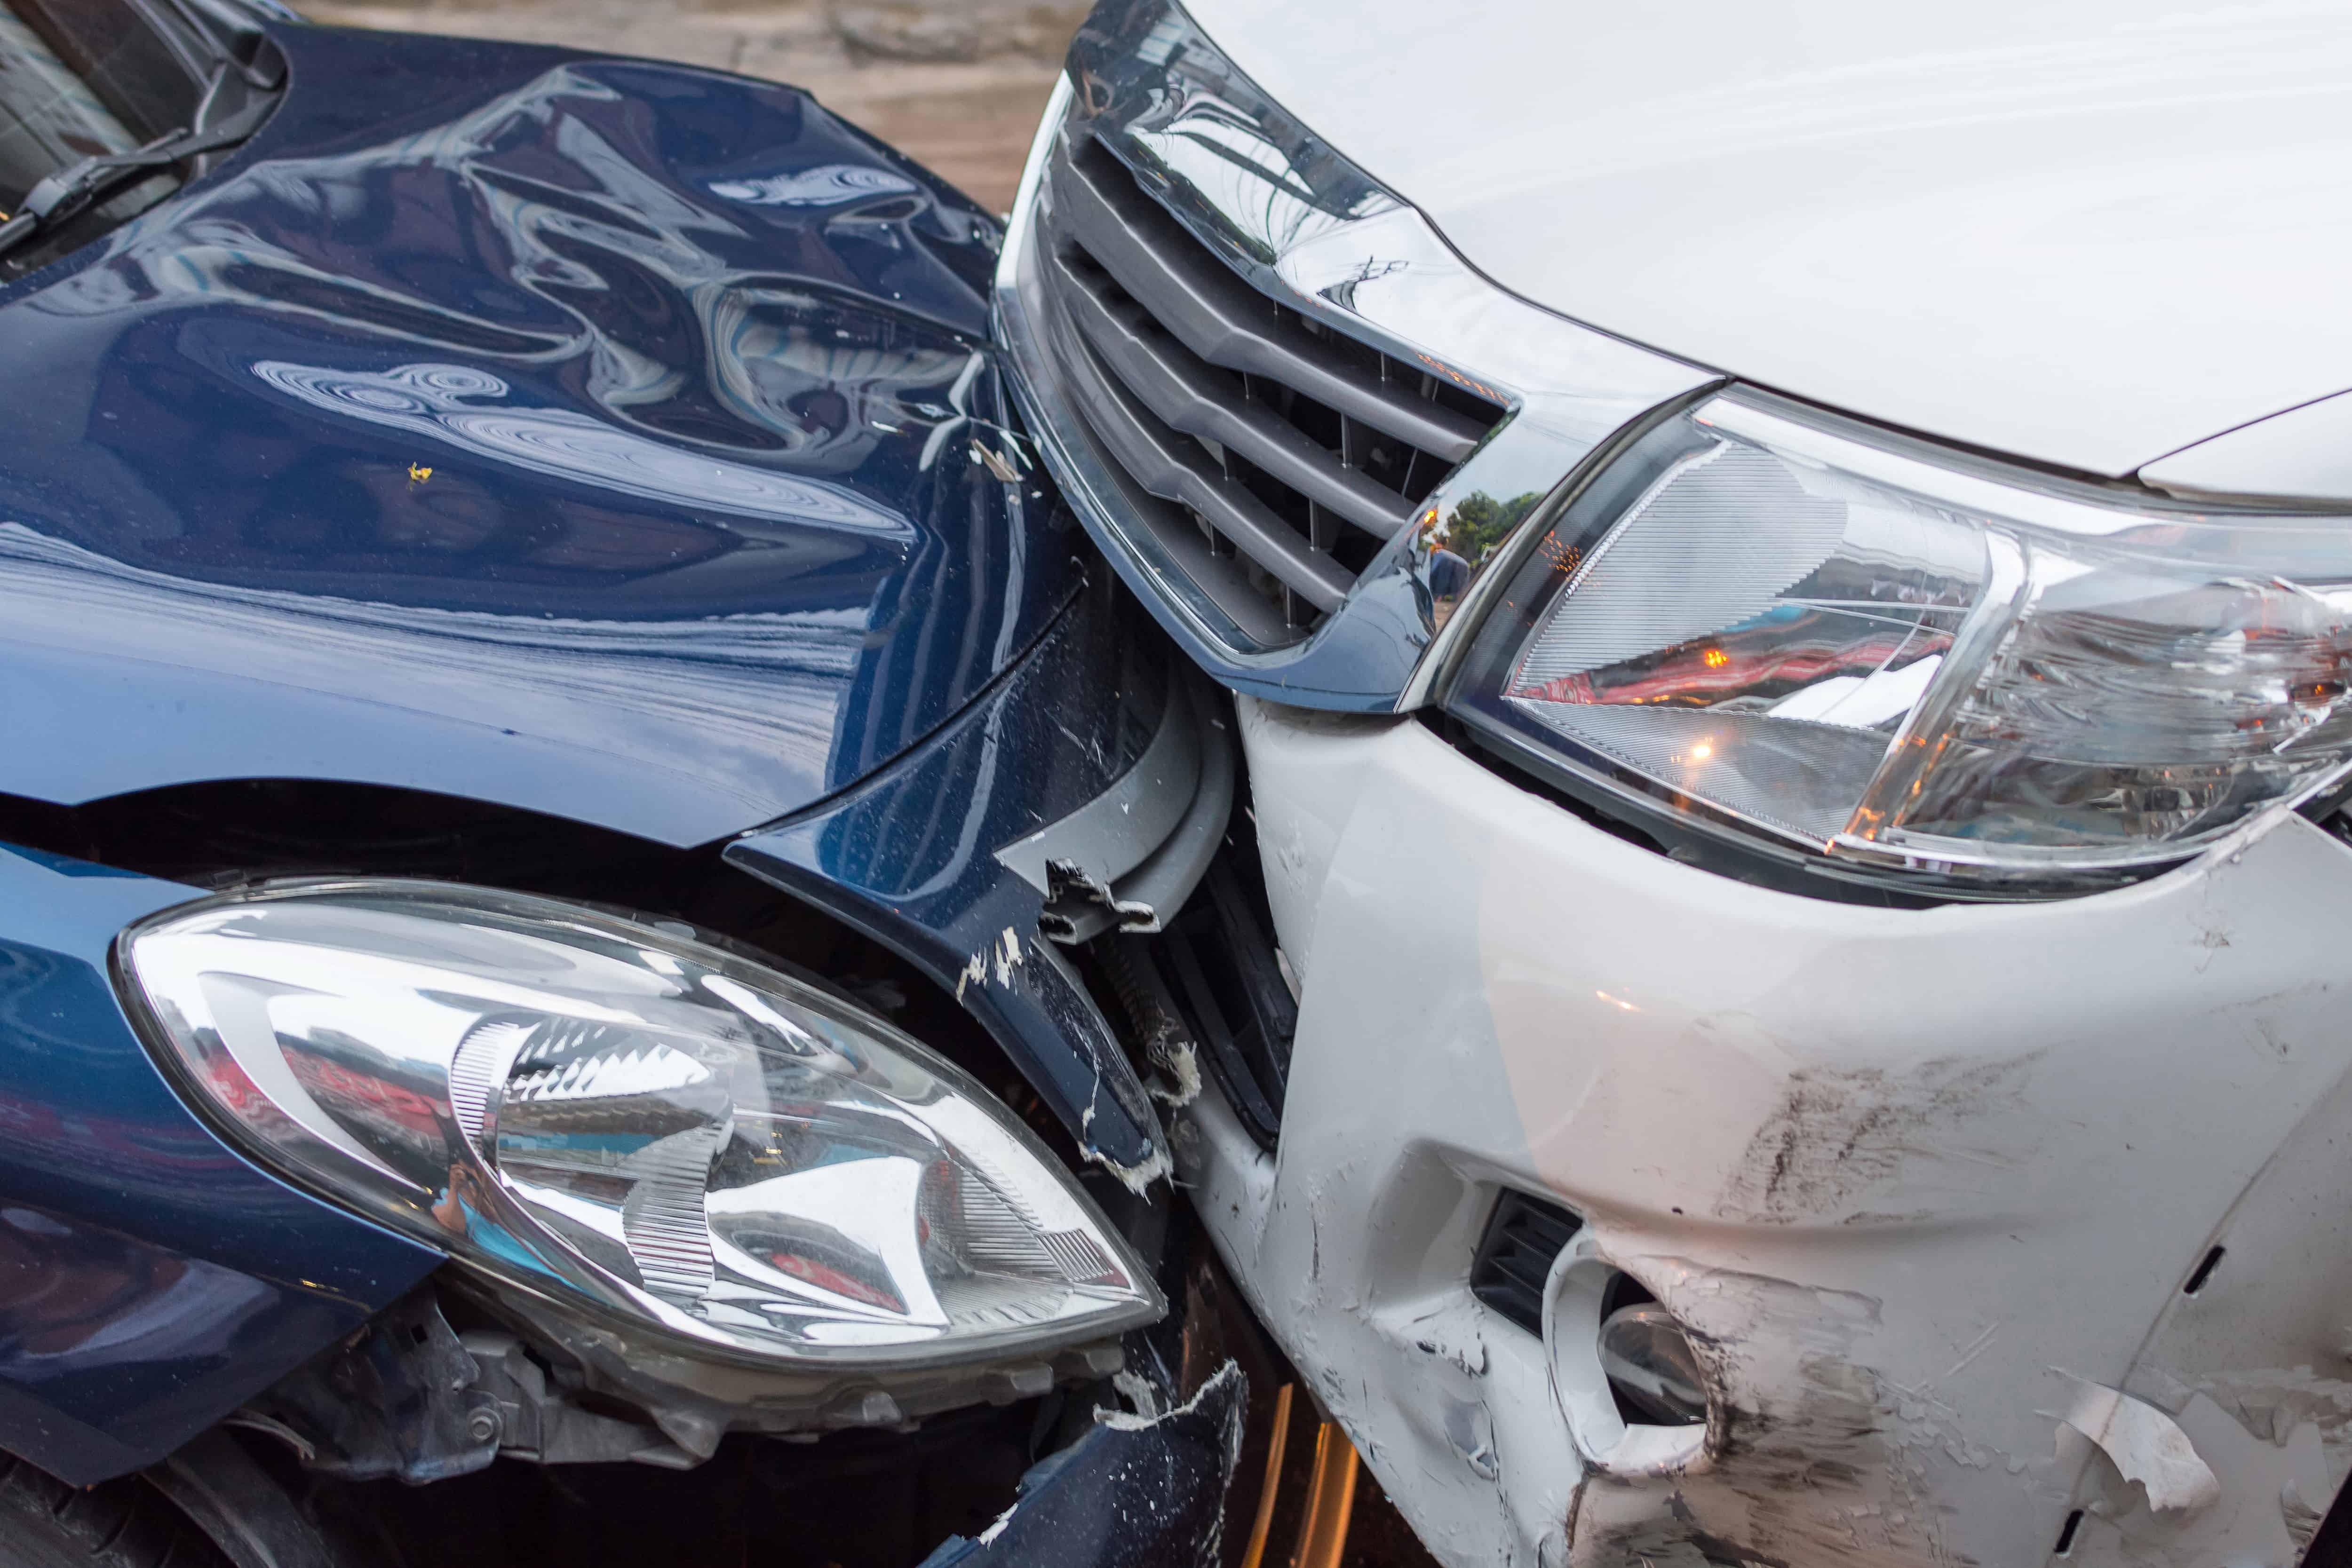 Modesto Man Killed, 1 Injured in Head-On Crash on Santa Fe Avenue [Turlock, CA]